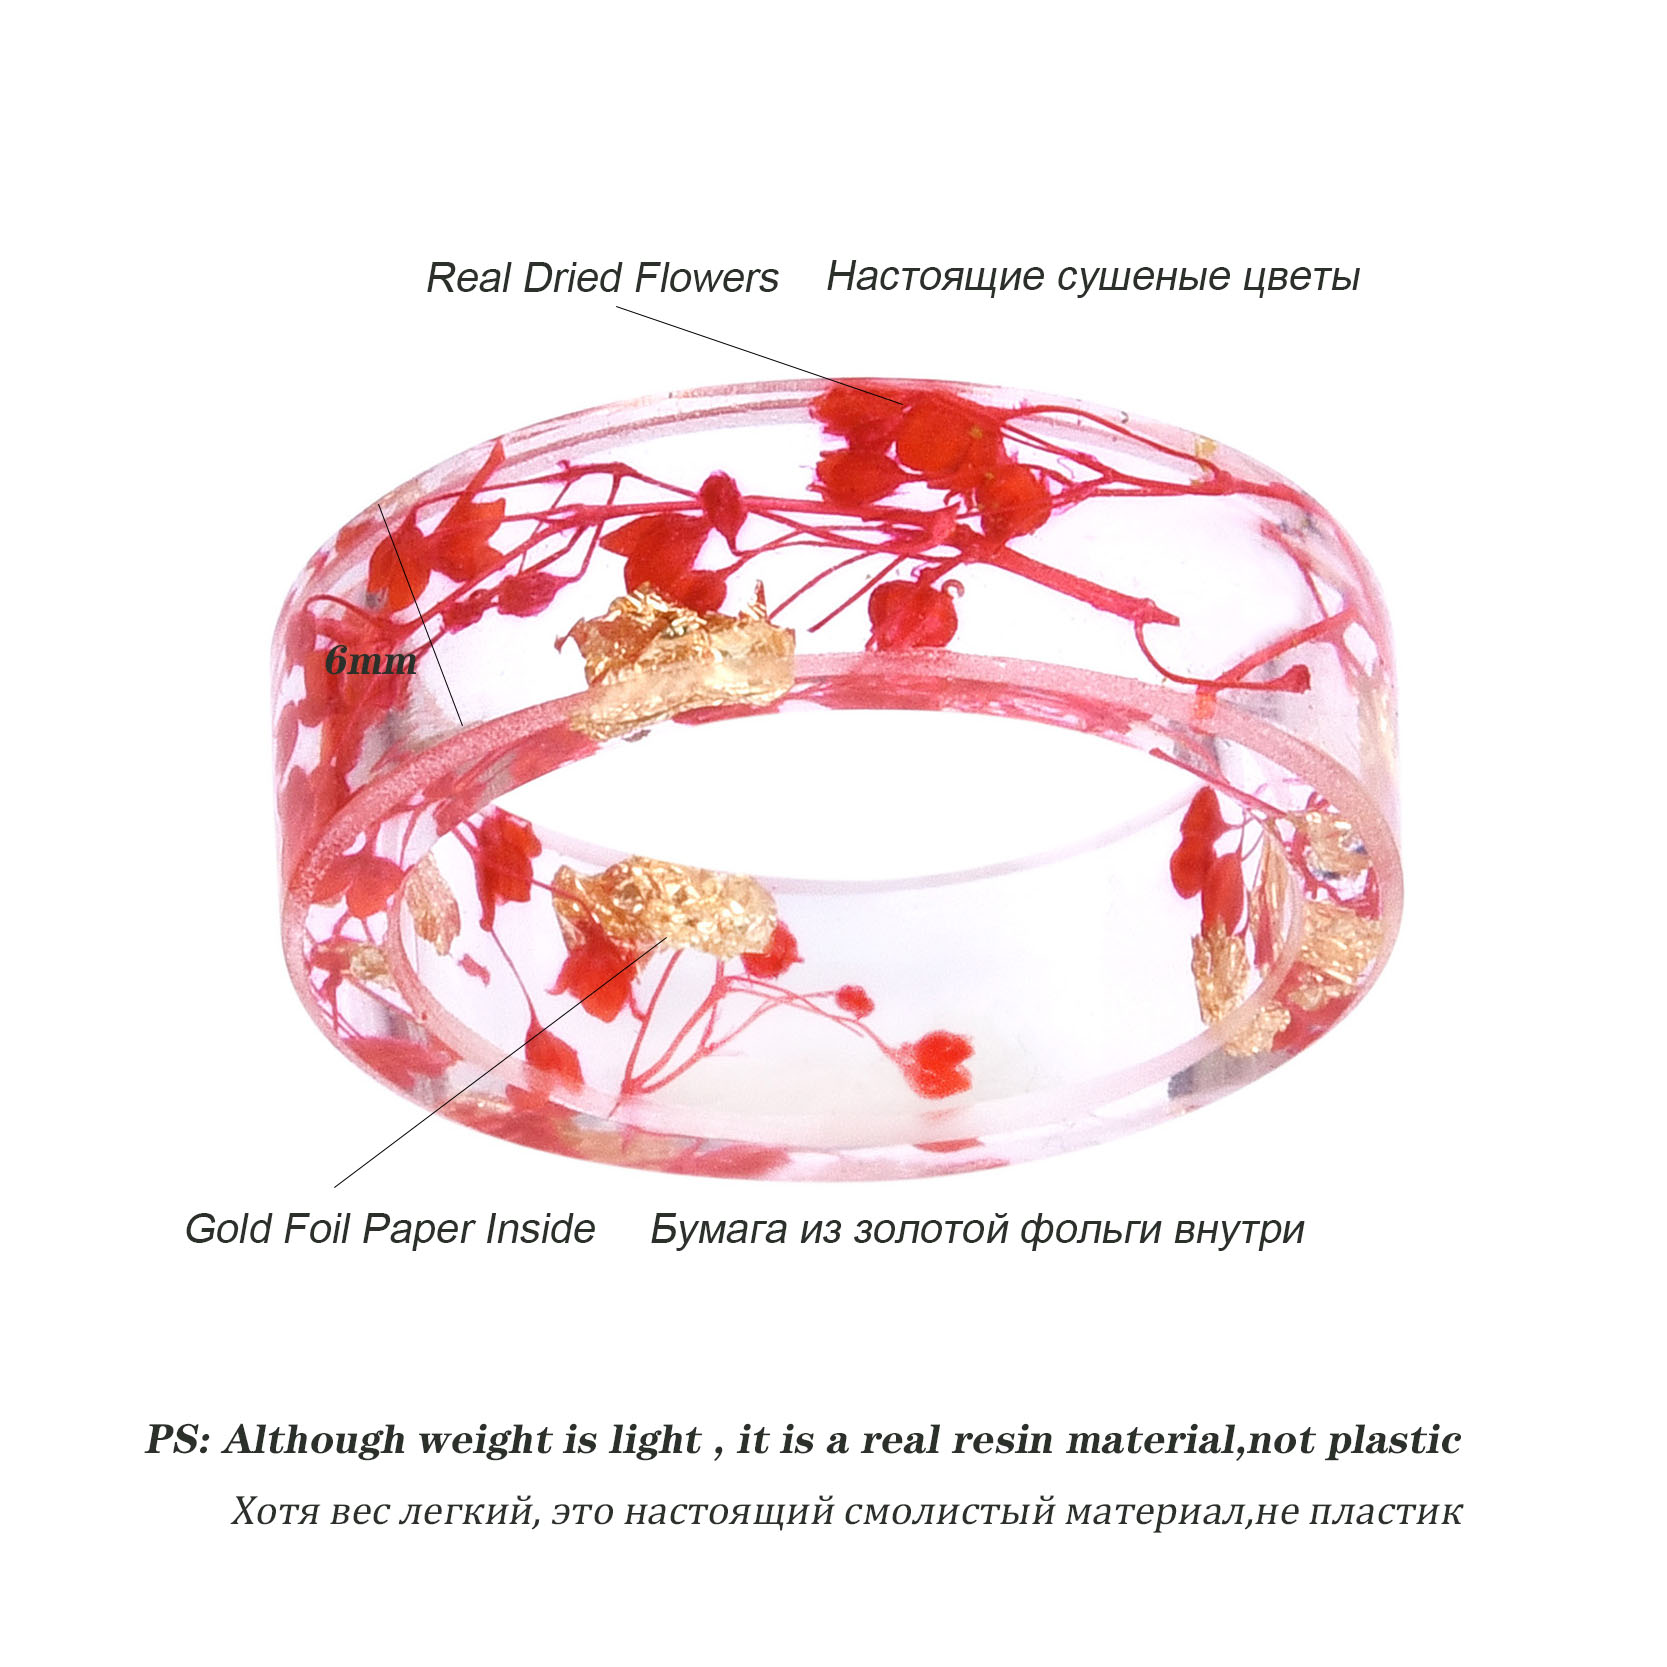 Hd8ee59e5549b4f5090b2ce50ad034ed3S - Crystalic Resin Ring